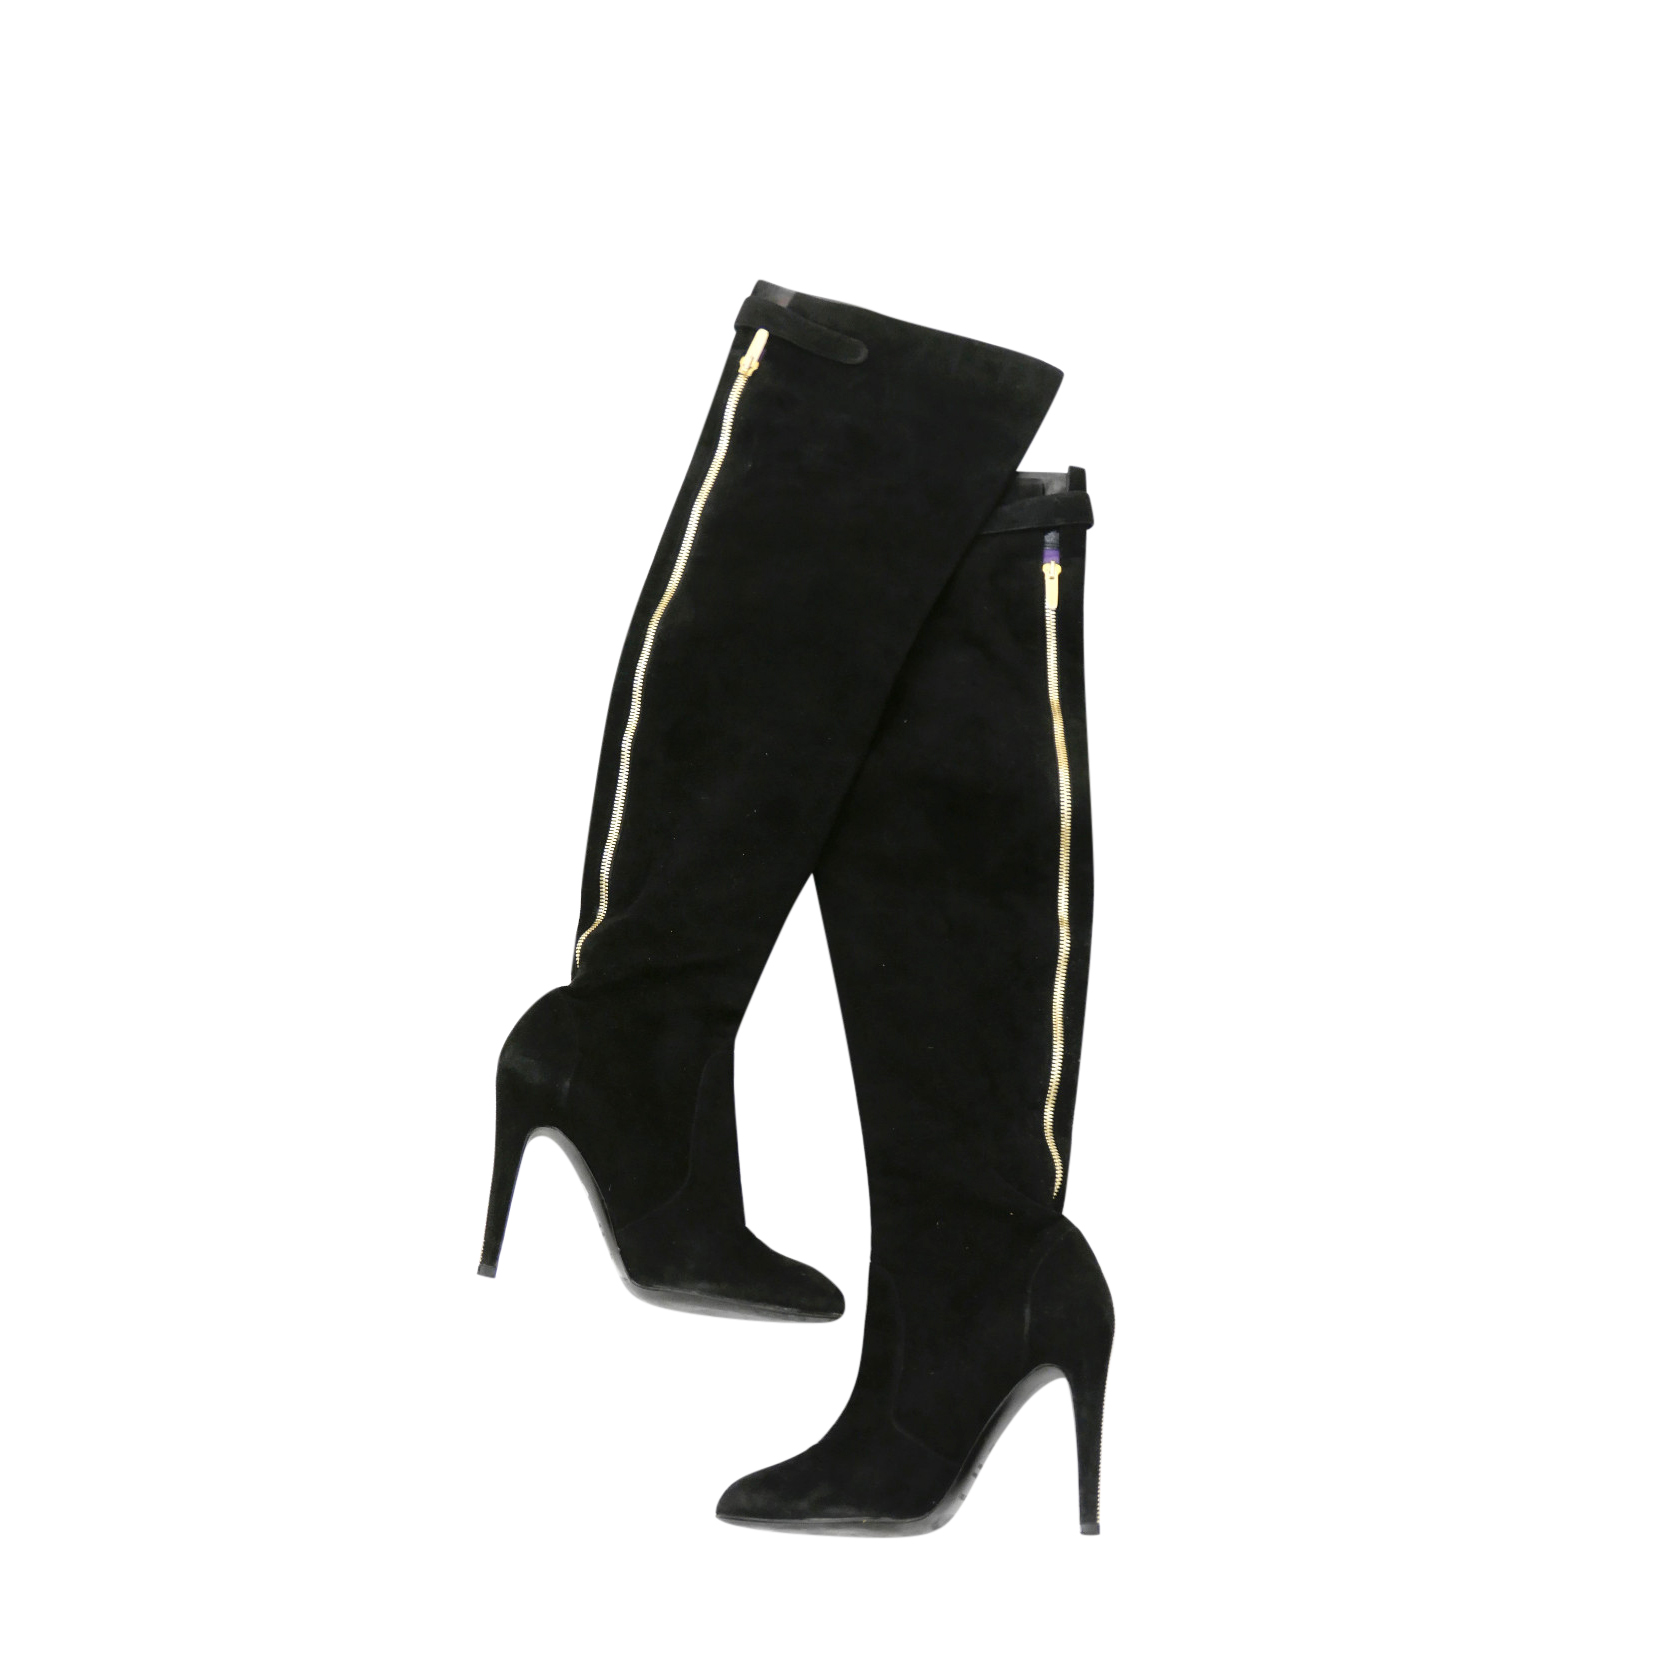 Sergio Rossi Black Suede OTK Boots